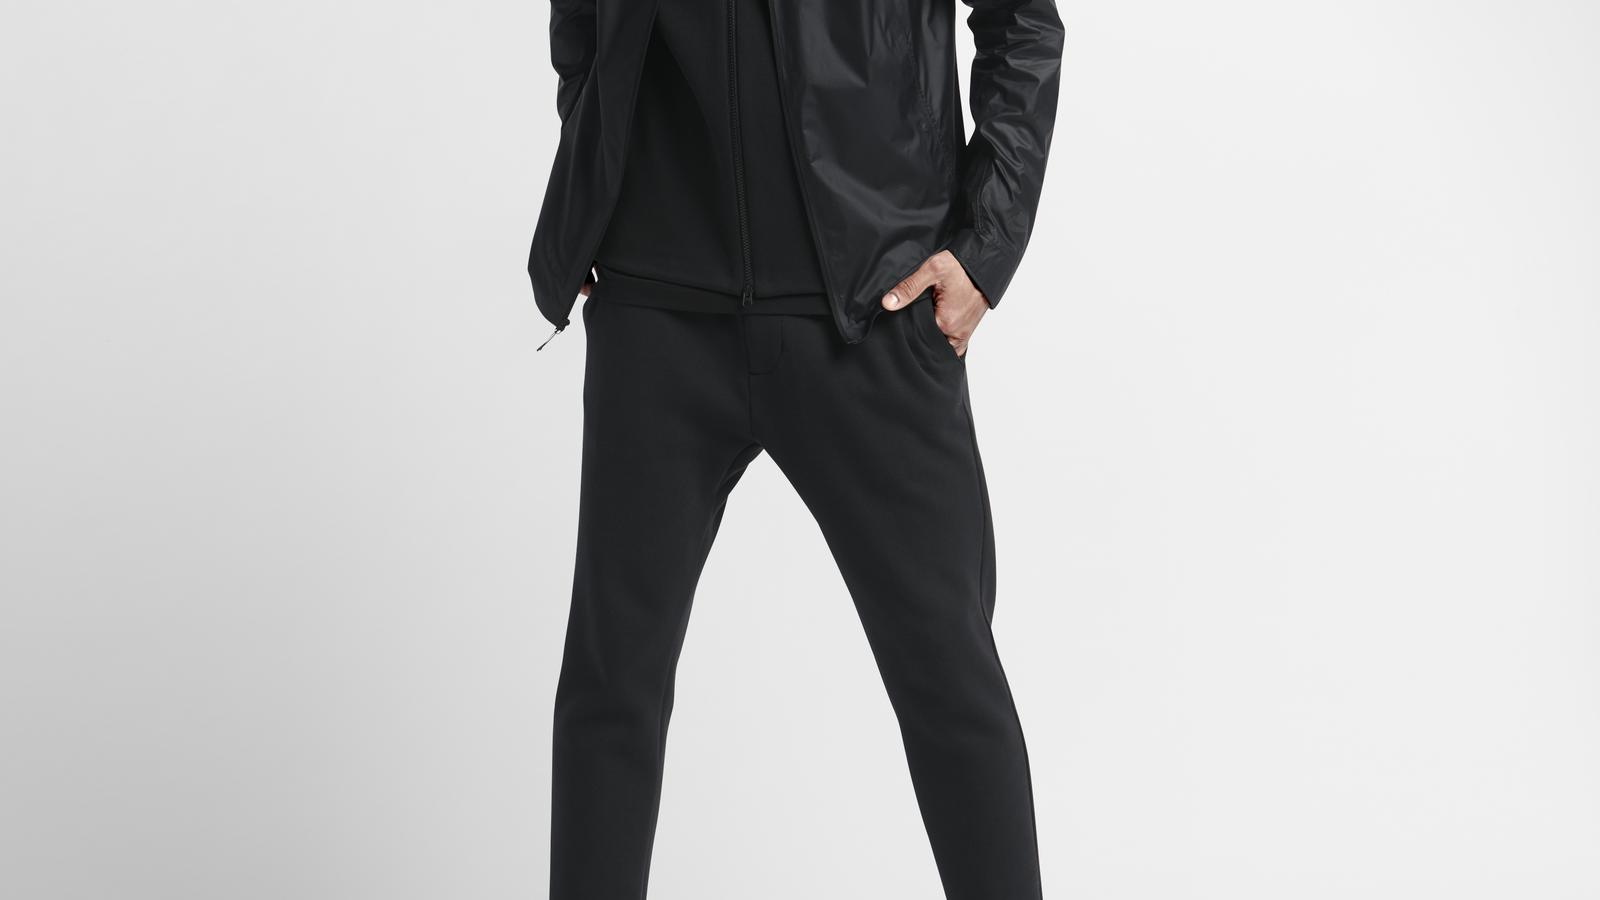 Nikelab transform jacket mens 1 hd 1600